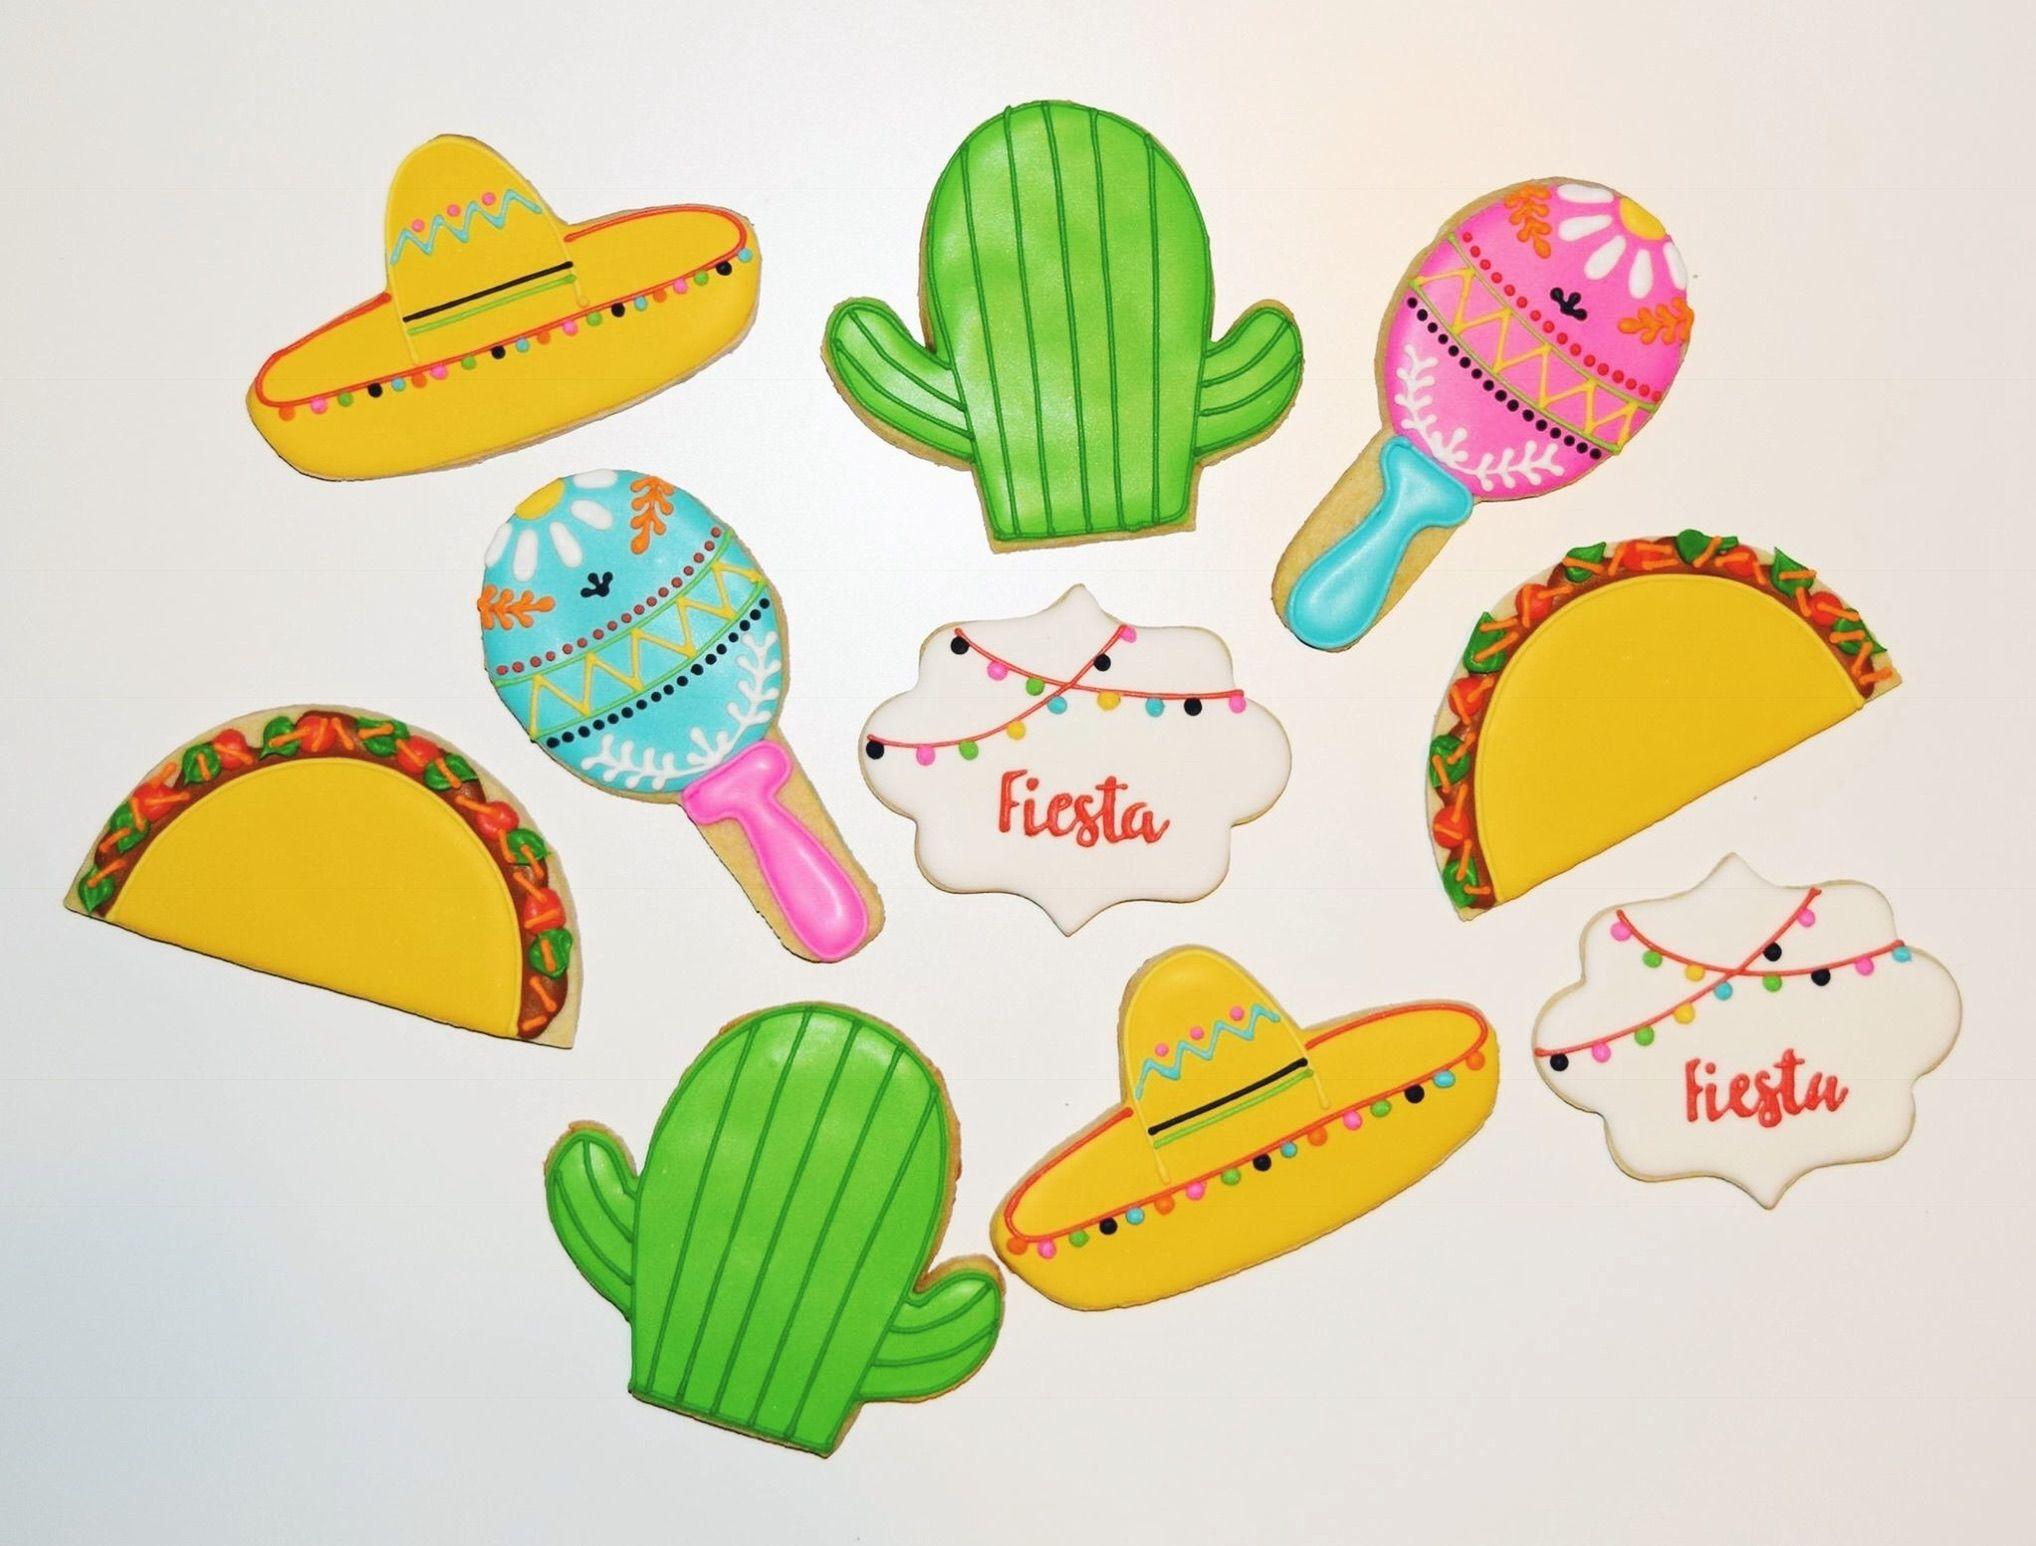 Fiesta-themed decorated cookies #tacocookies #fiestacookies #cactuscookies